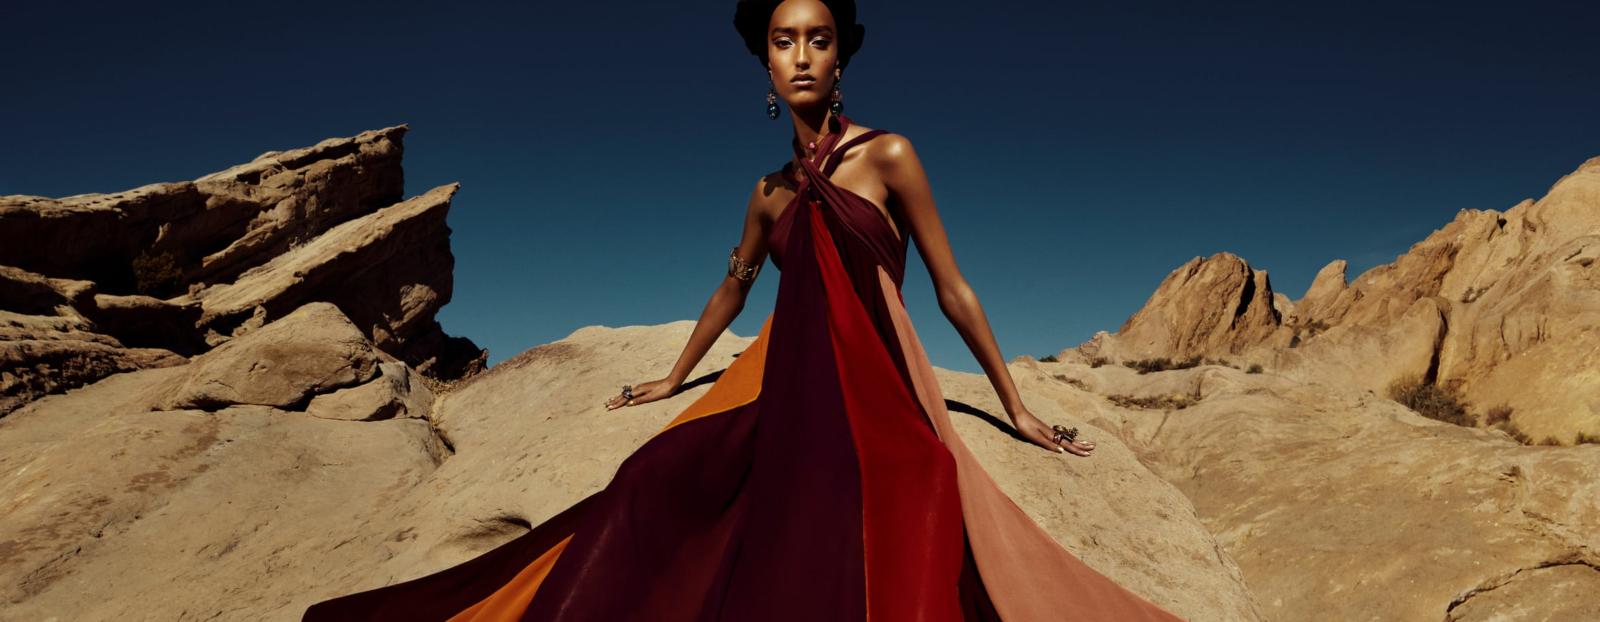 Biramo za vas: 15 najboljih komada sa Zara rasprodaje